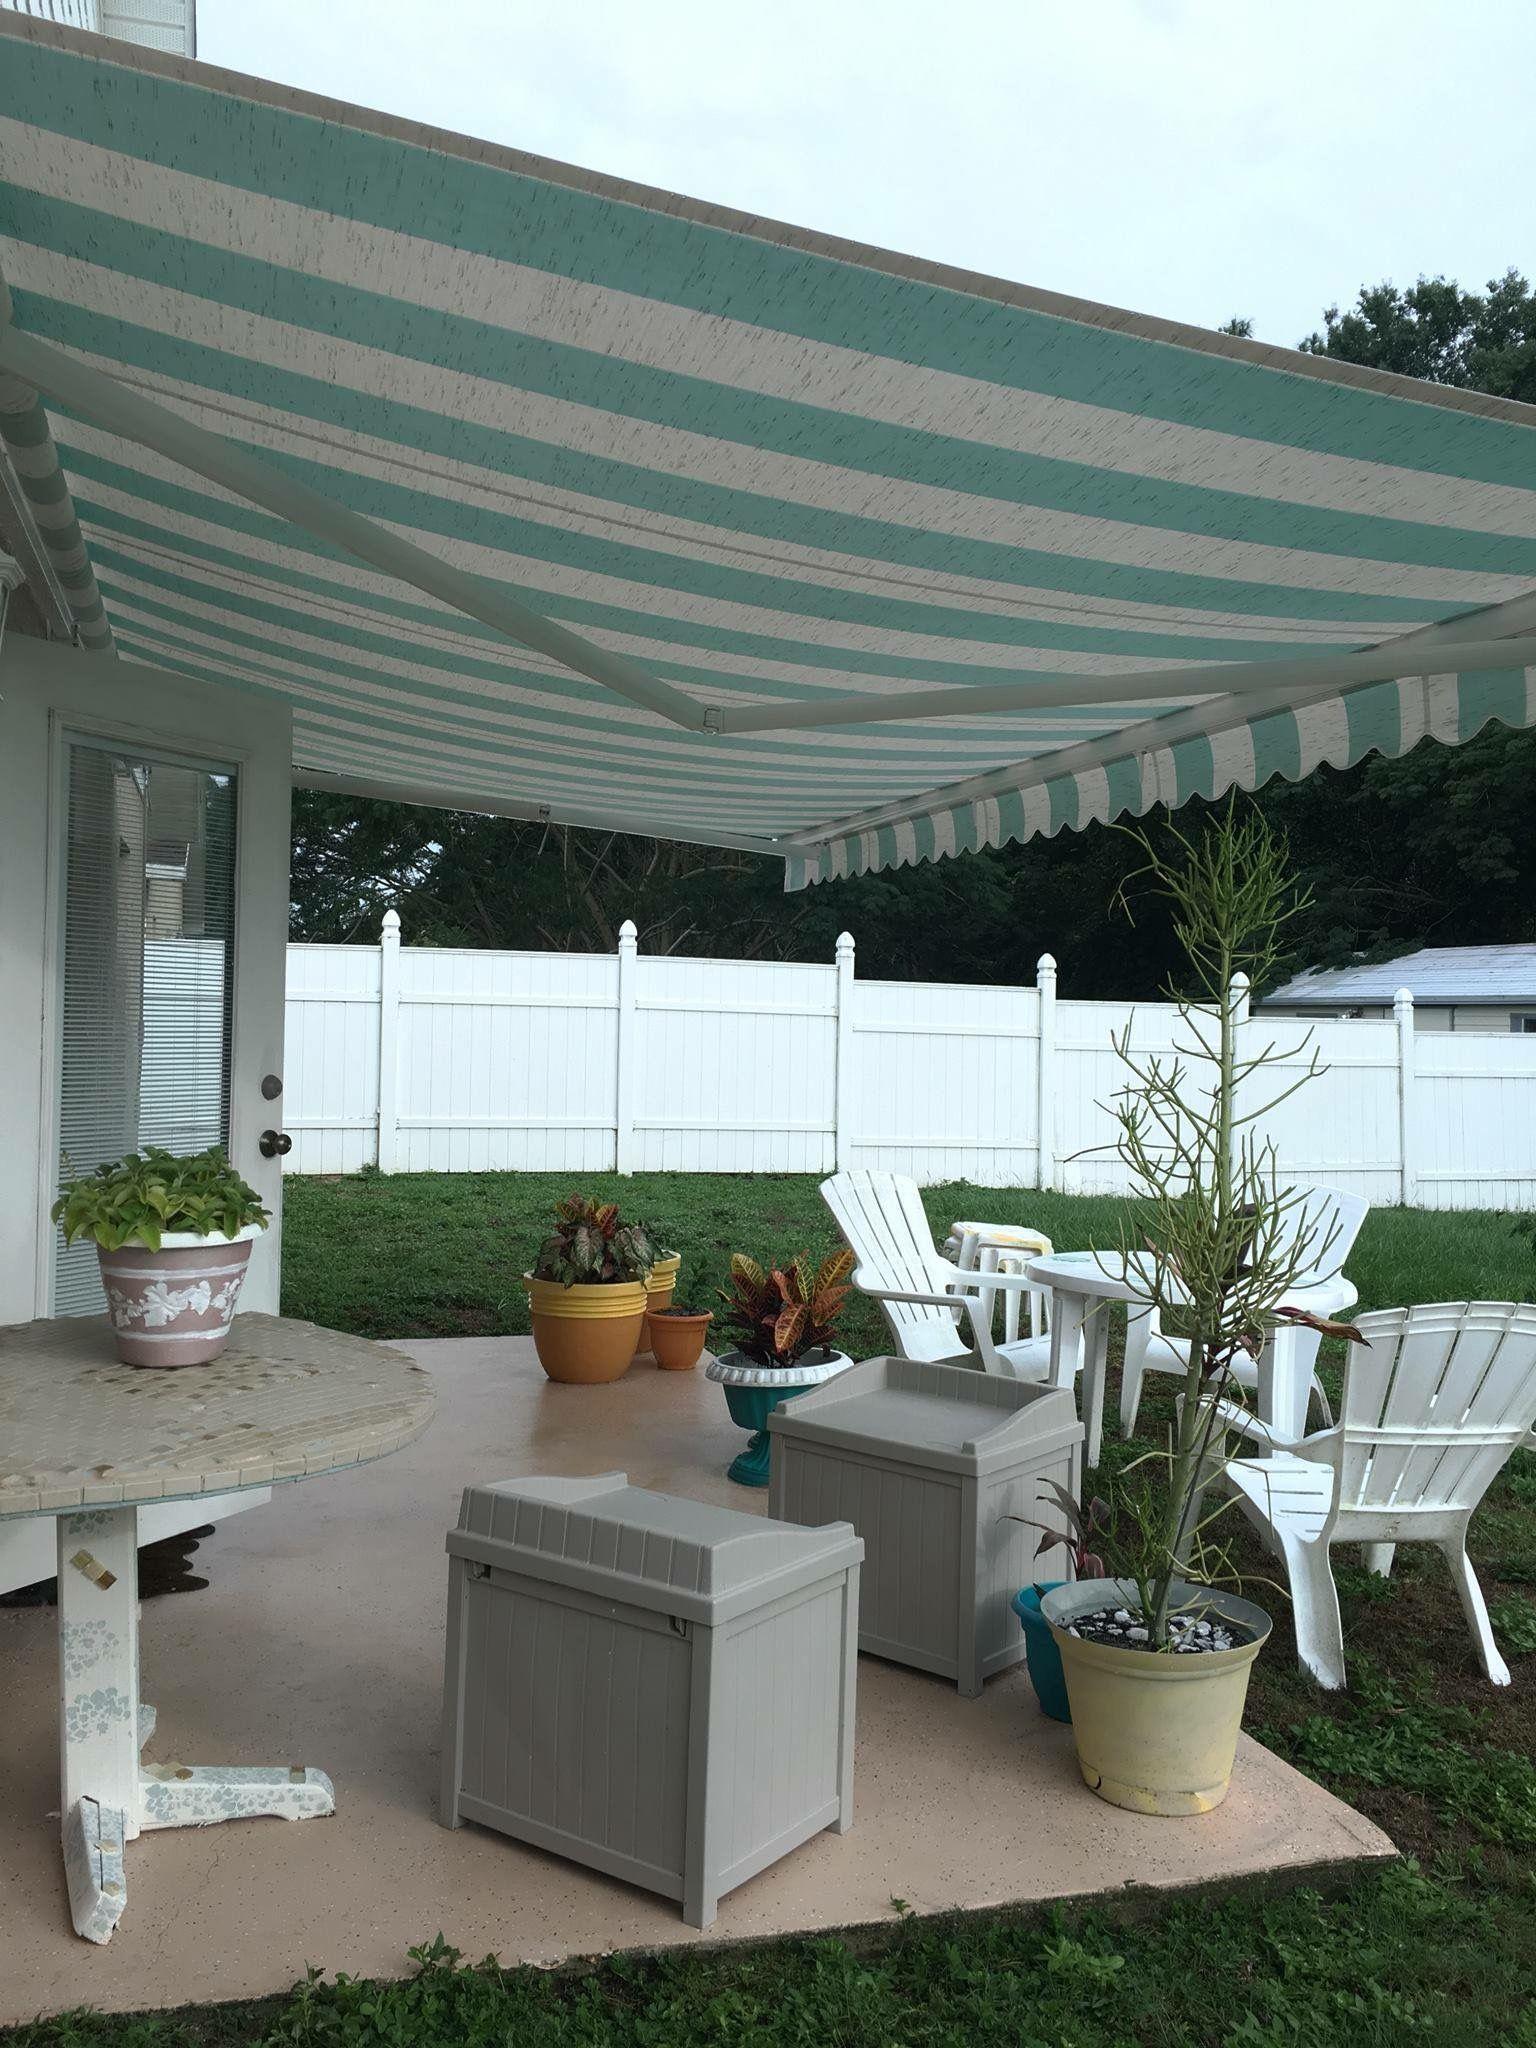 Innovative Retractable Awning Ideas Pictures Design For Your Summer Pergola Plans Diy Pergola Backyard Pergola